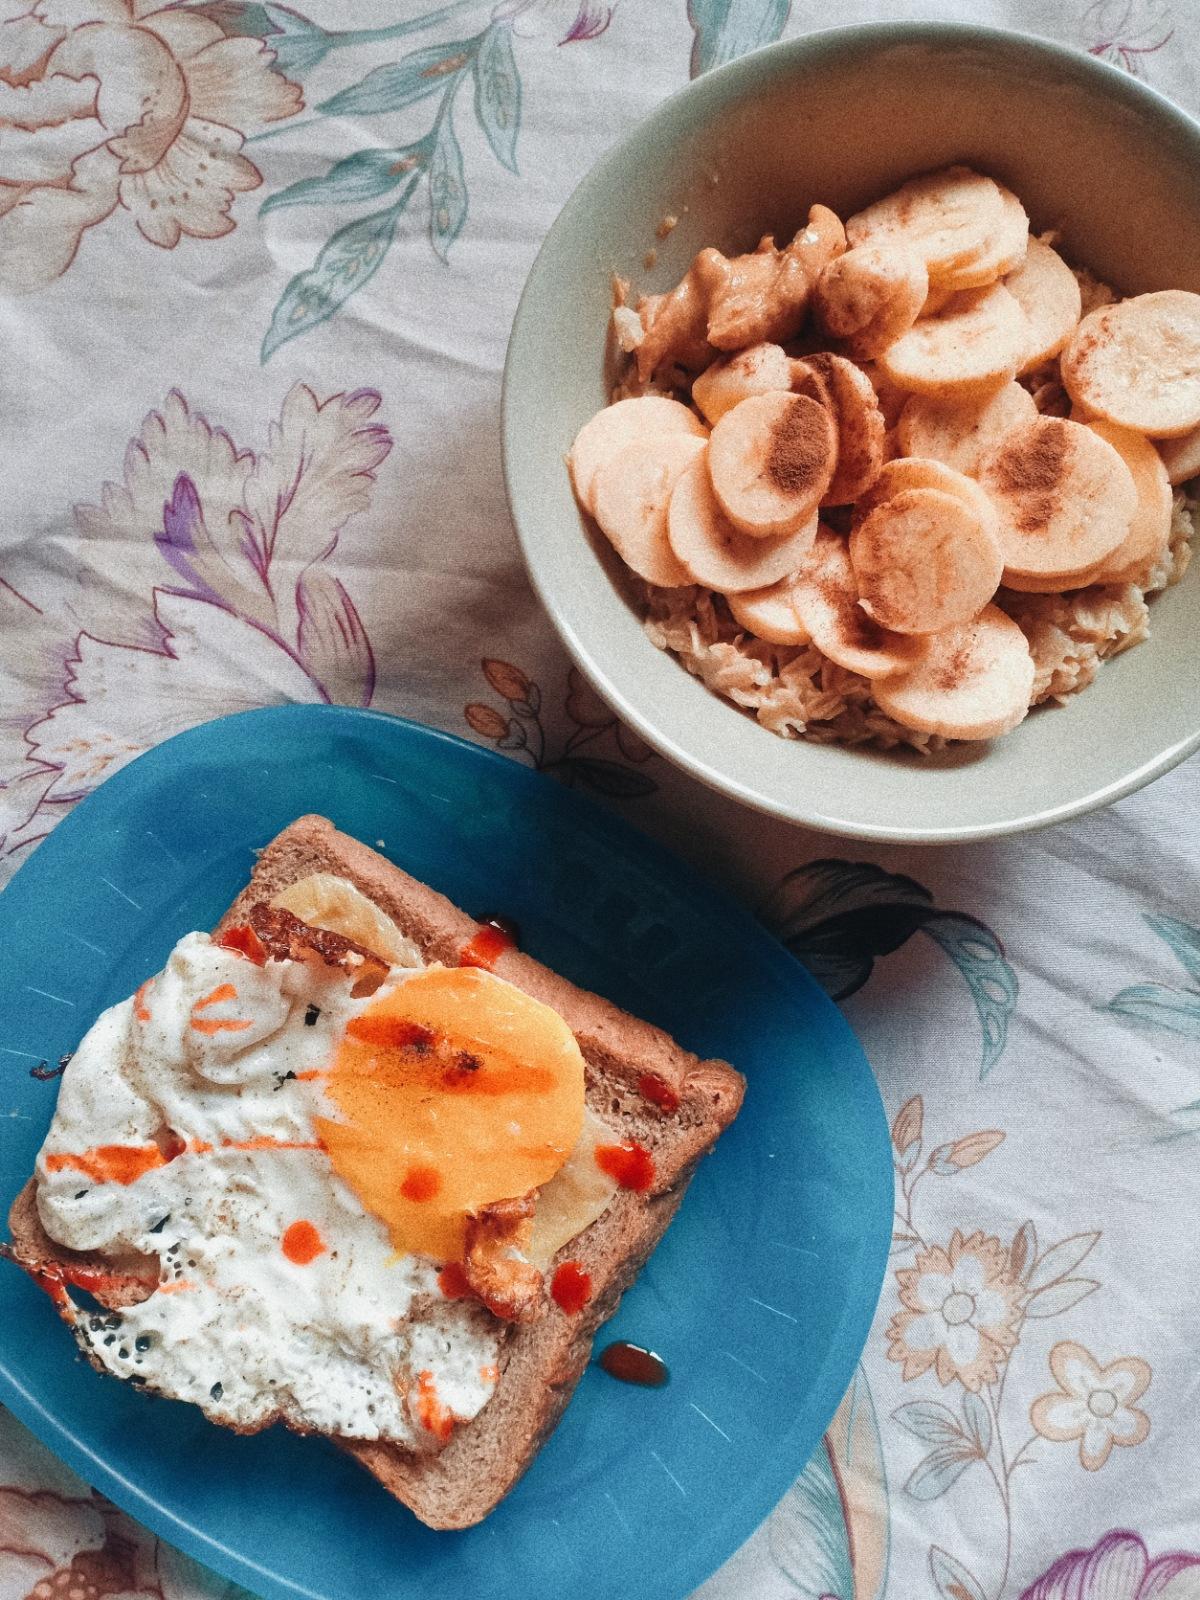 Life Lately #2: Netflix, Diet, and Faith